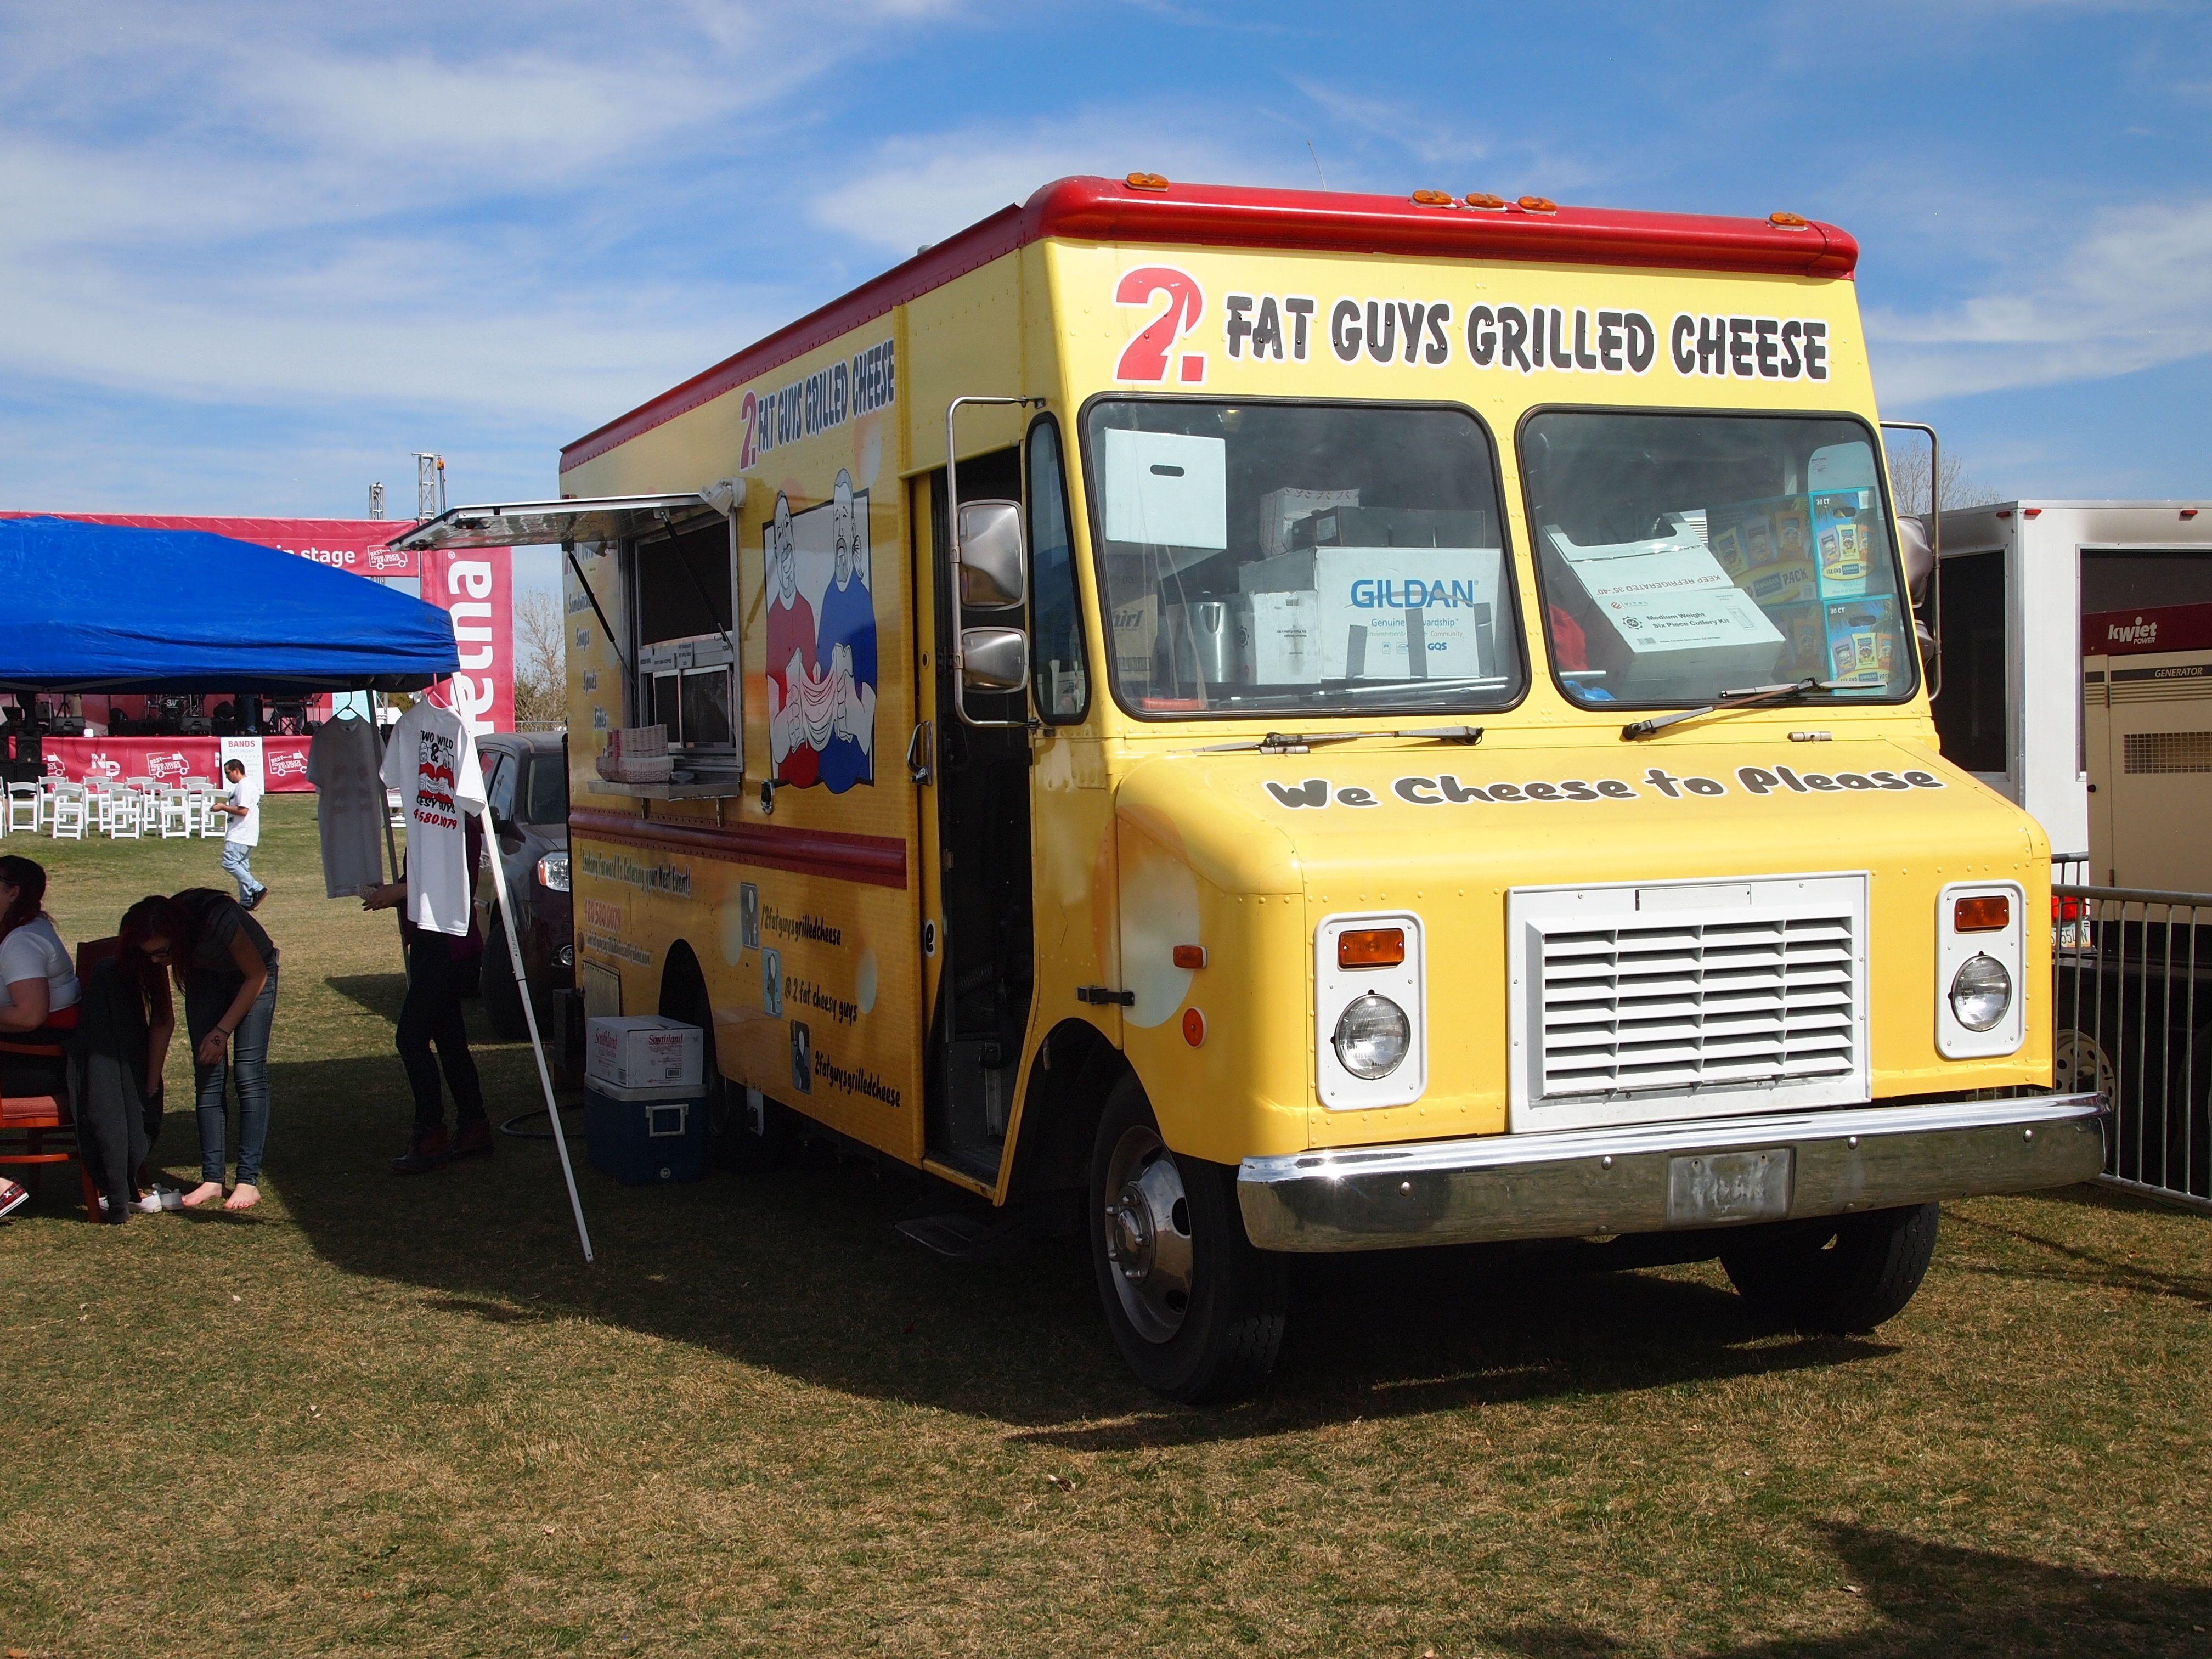 2 Fat Guys Grilled Cheese #Phoenix #Arizona #FoodTruck